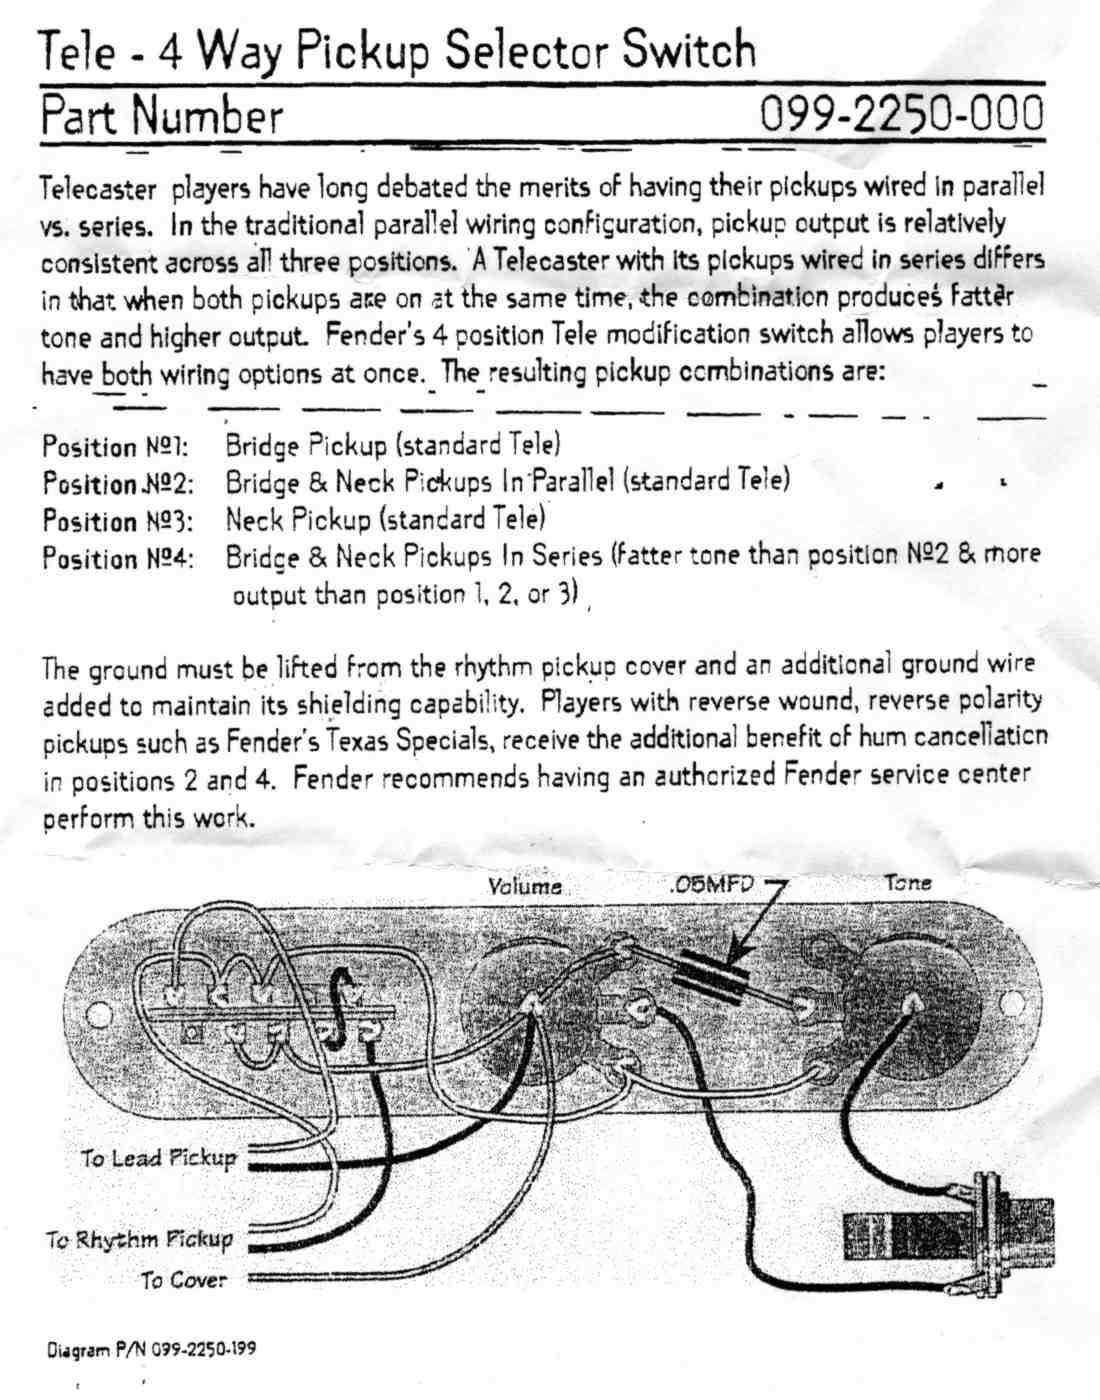 Blue Guitar Schematics on tele humbucker wiring, jazz bass wiring, tele wiring diagram, tele pickups magnets, tele pickup dimensions, tele bridge wiring,